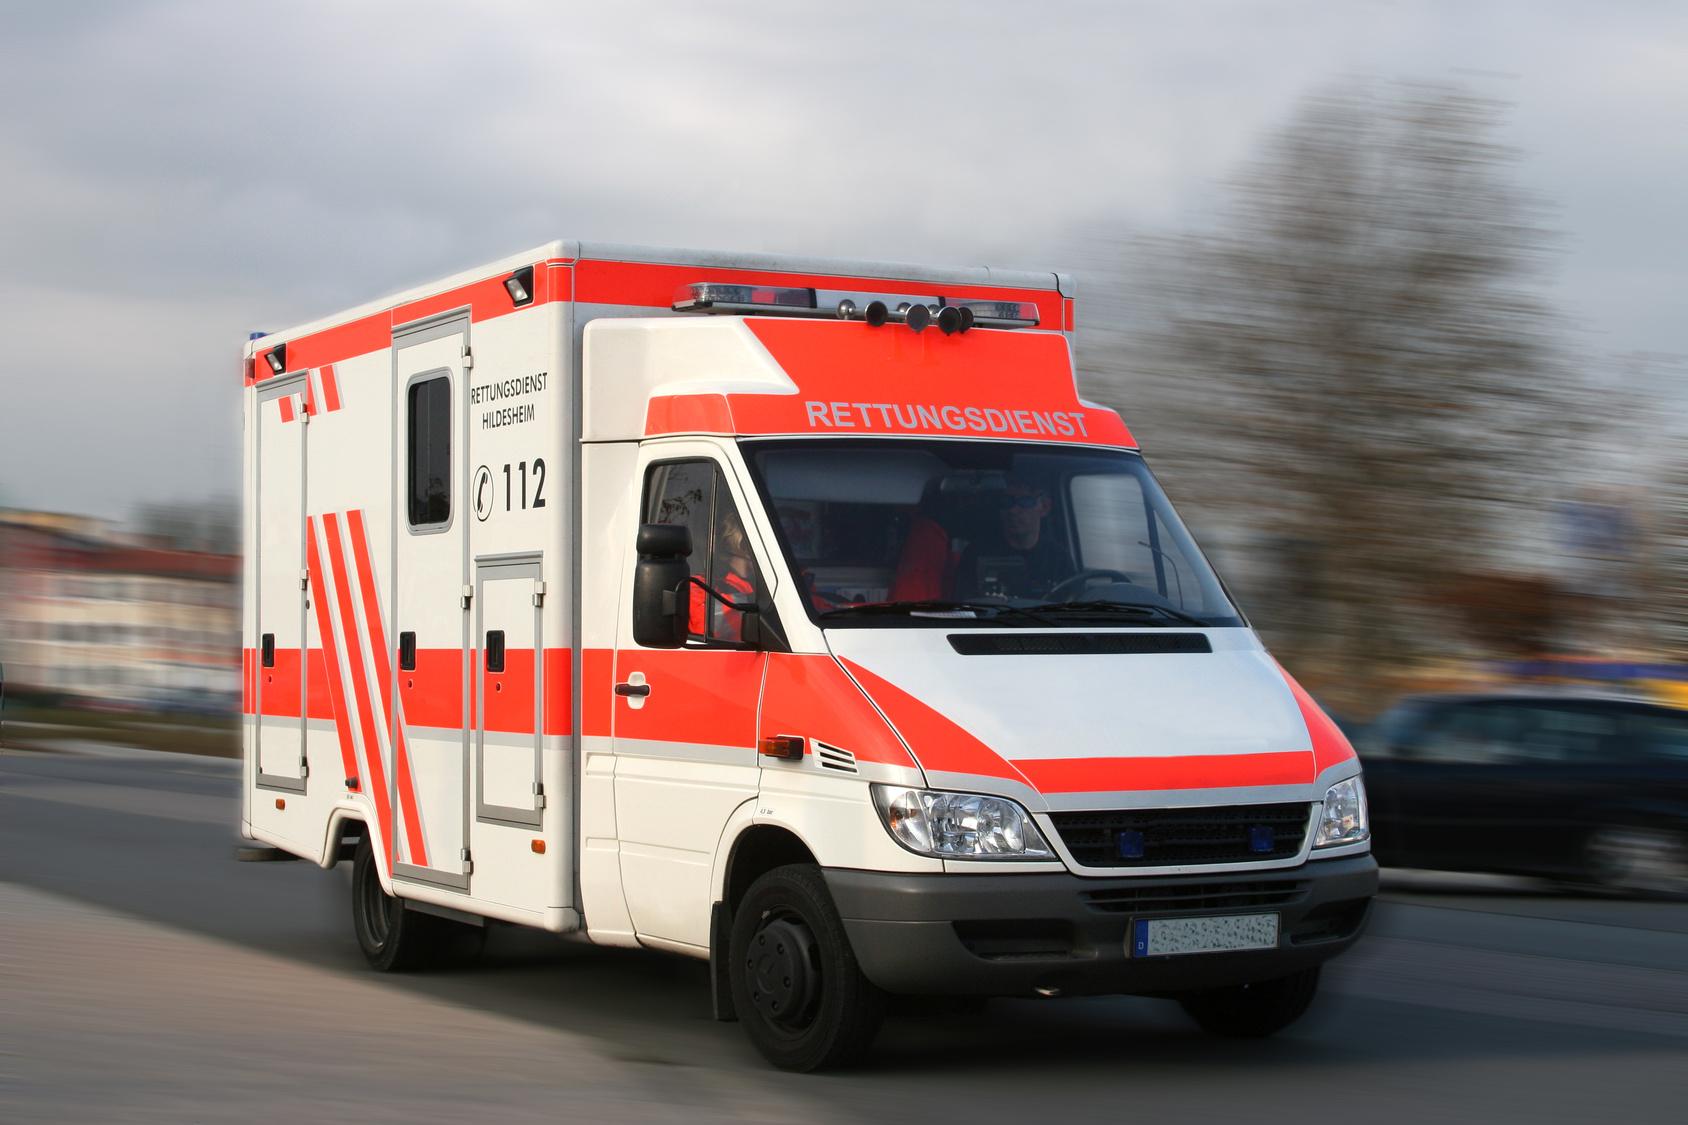 Koronare Herzkrankheit – Notfall | Französisch - français